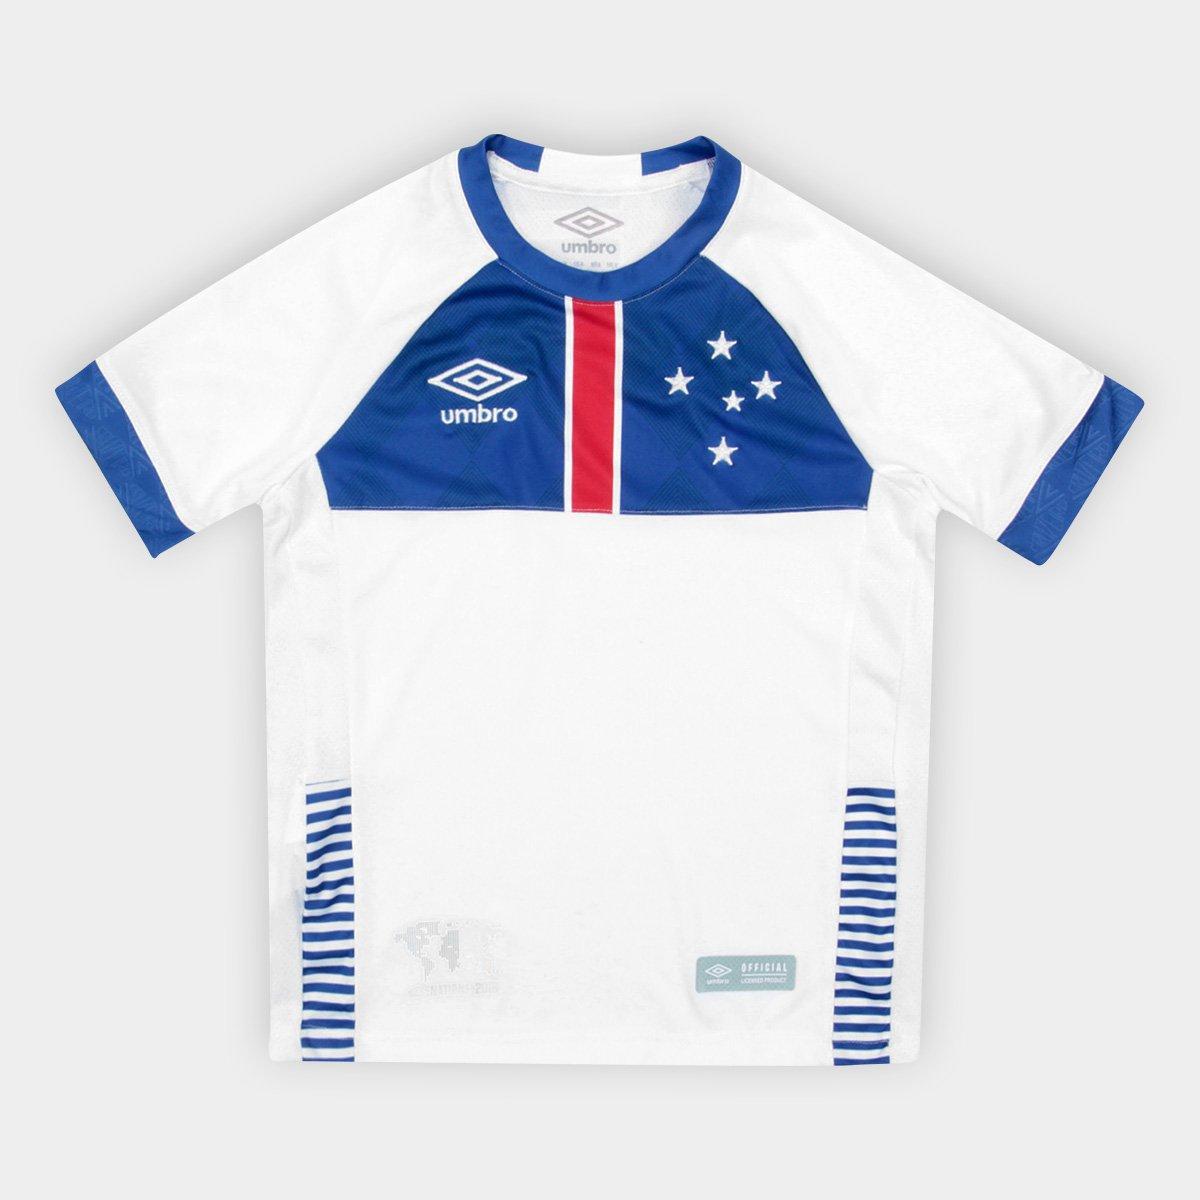 6b6a517cd5 e Vikingur Branco Blaa Infantil s 2018 Azul Torcedor Umbro Camisa n°  Cruzeiro II qwF4C4 ...